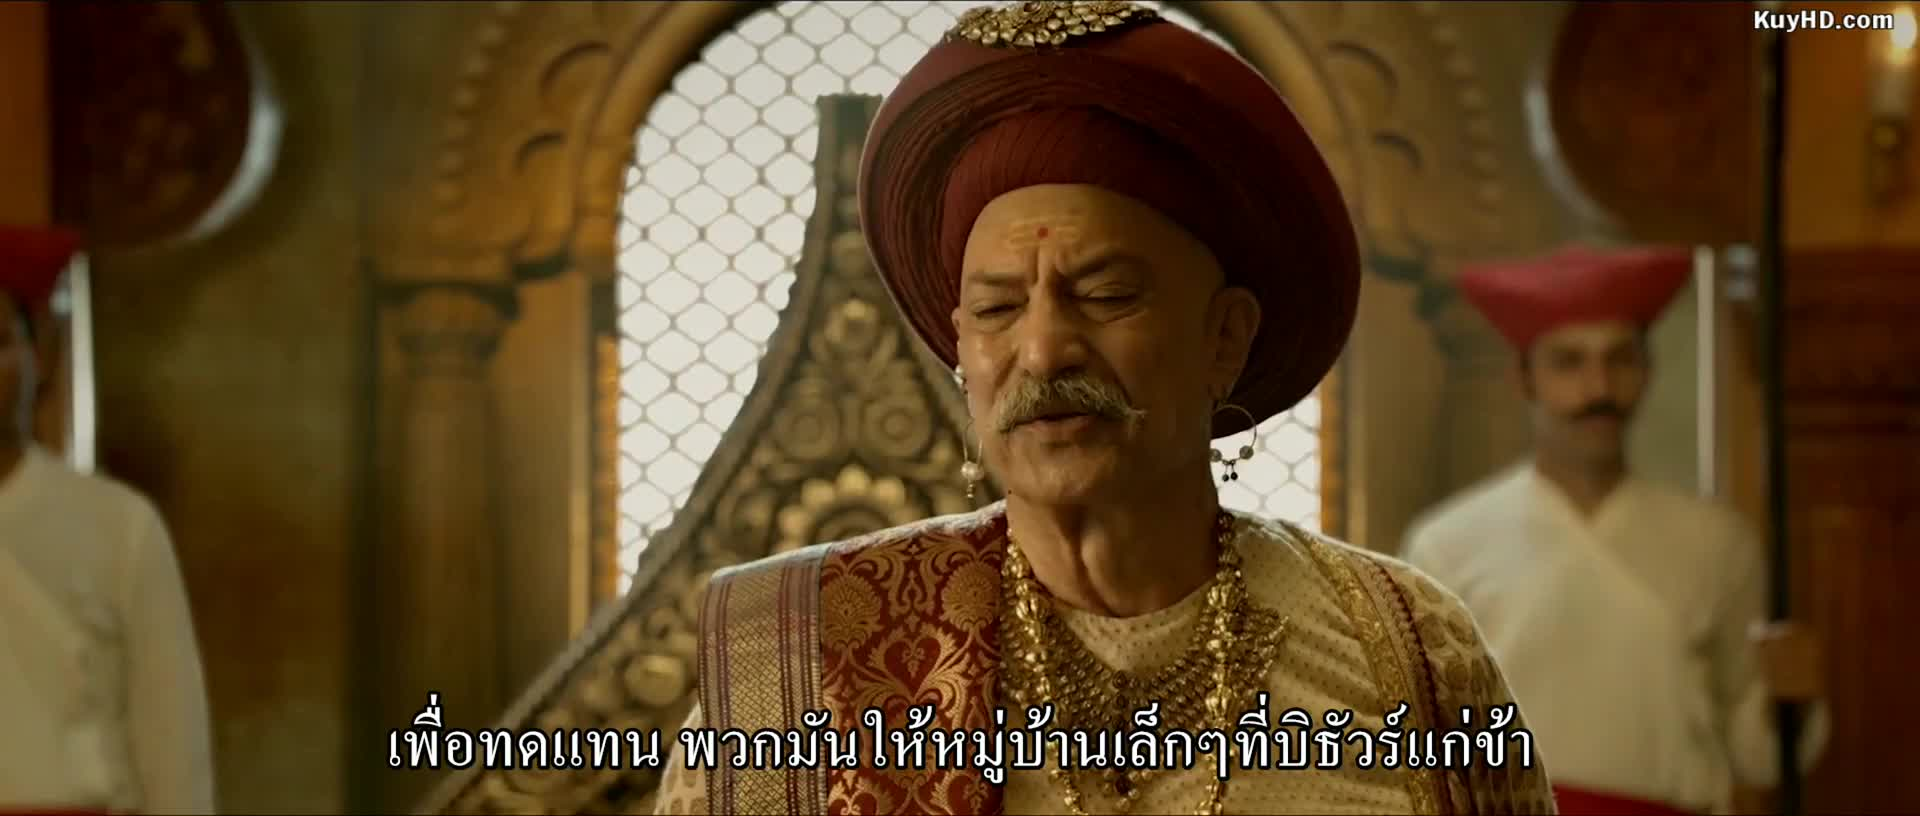 Manikarnika The Queen of Jhansi (2019) มานิกานกรรณิการ์ ราชินีแห่ง เจฮานซี่ - ดูหนัง หนัง ดูหนังออนไลน์ หนังใหม่ ดูหนังฟรี